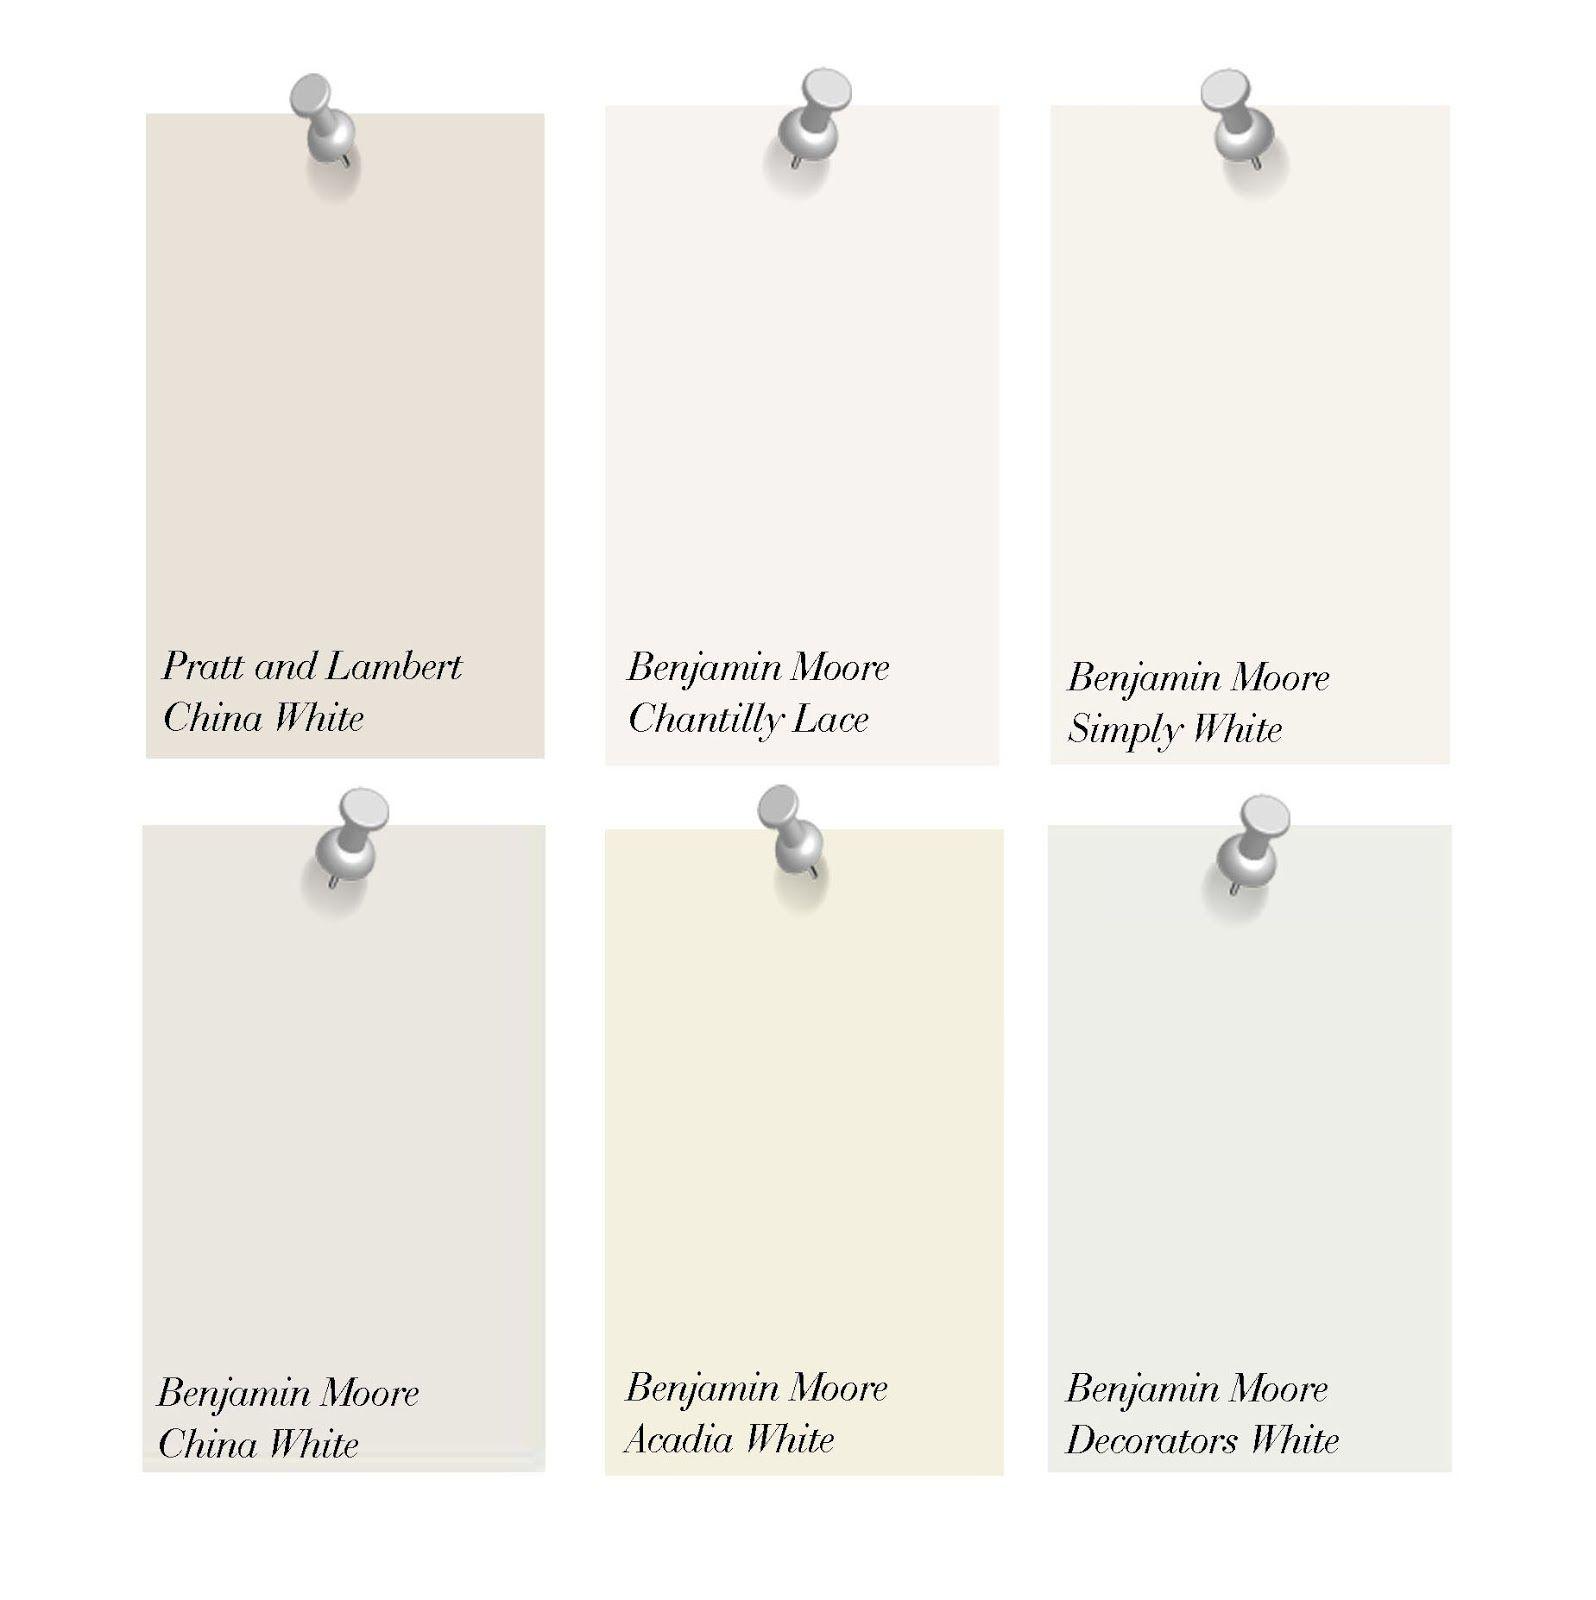 Benjamin Moore Off Whites 1 Kelly Wearstler China White By Pratt And Lambert 2 Maria